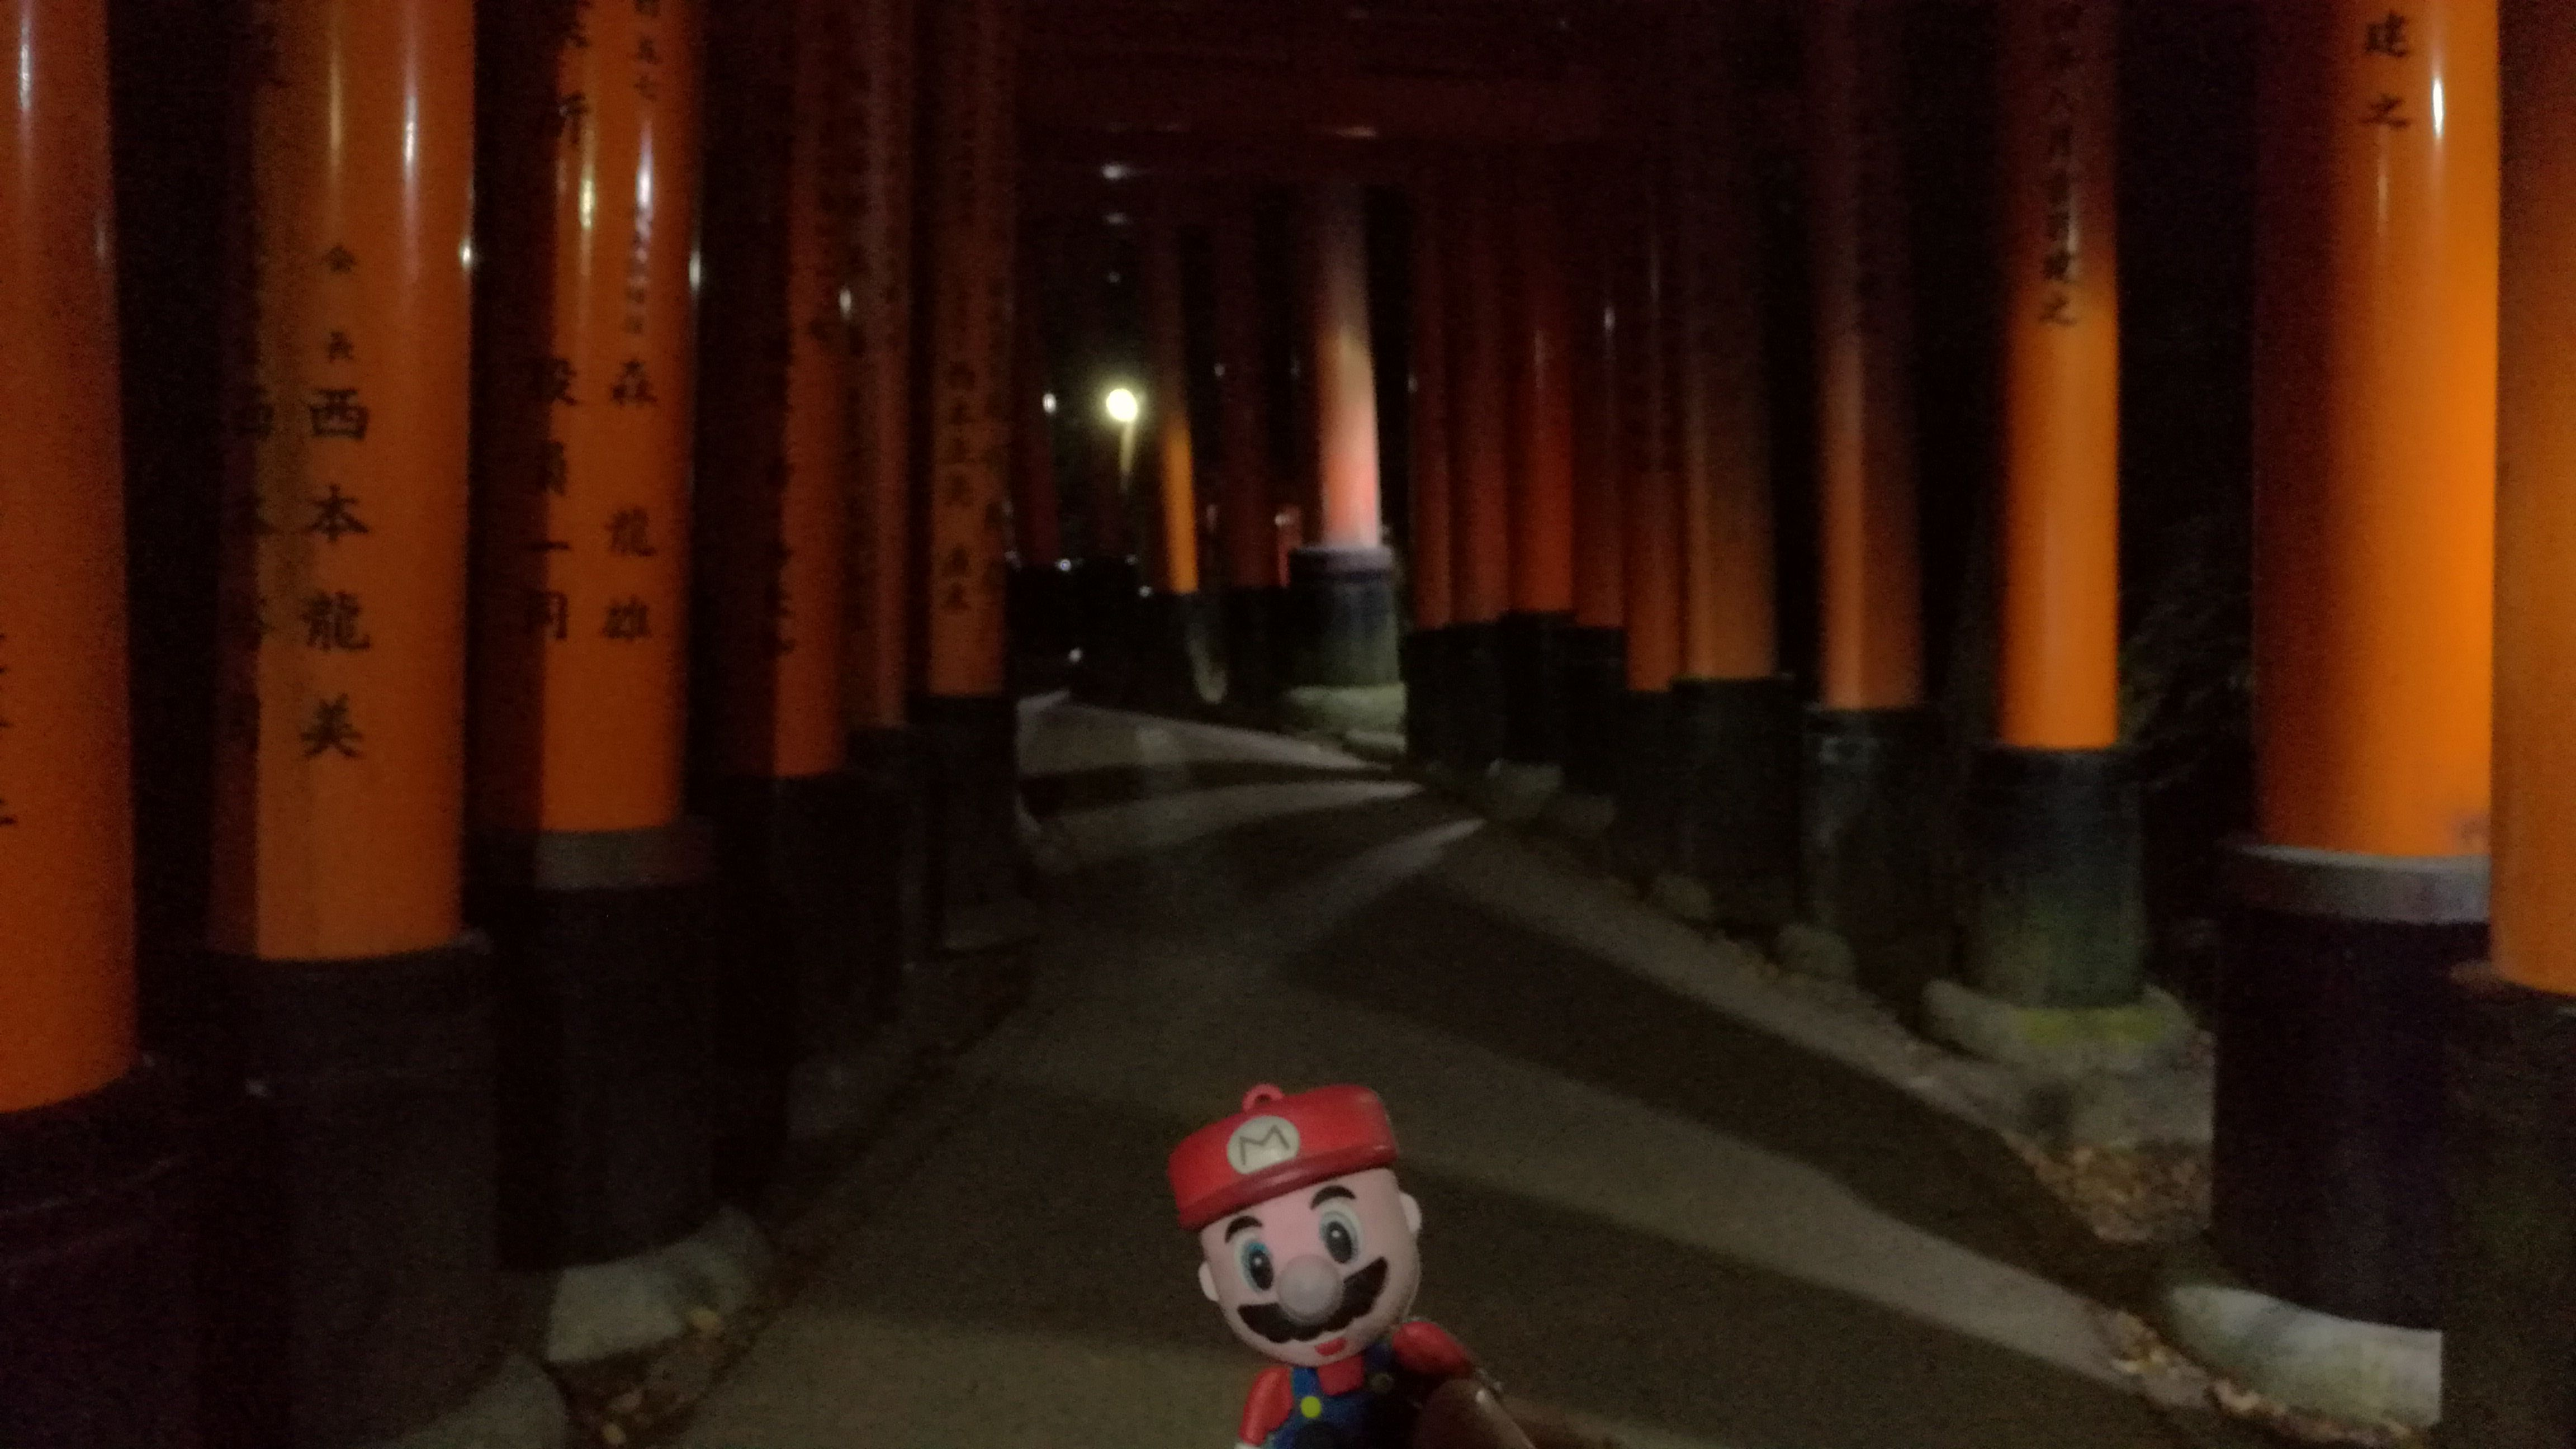 En el Templo Fushimi Inari en Kioto